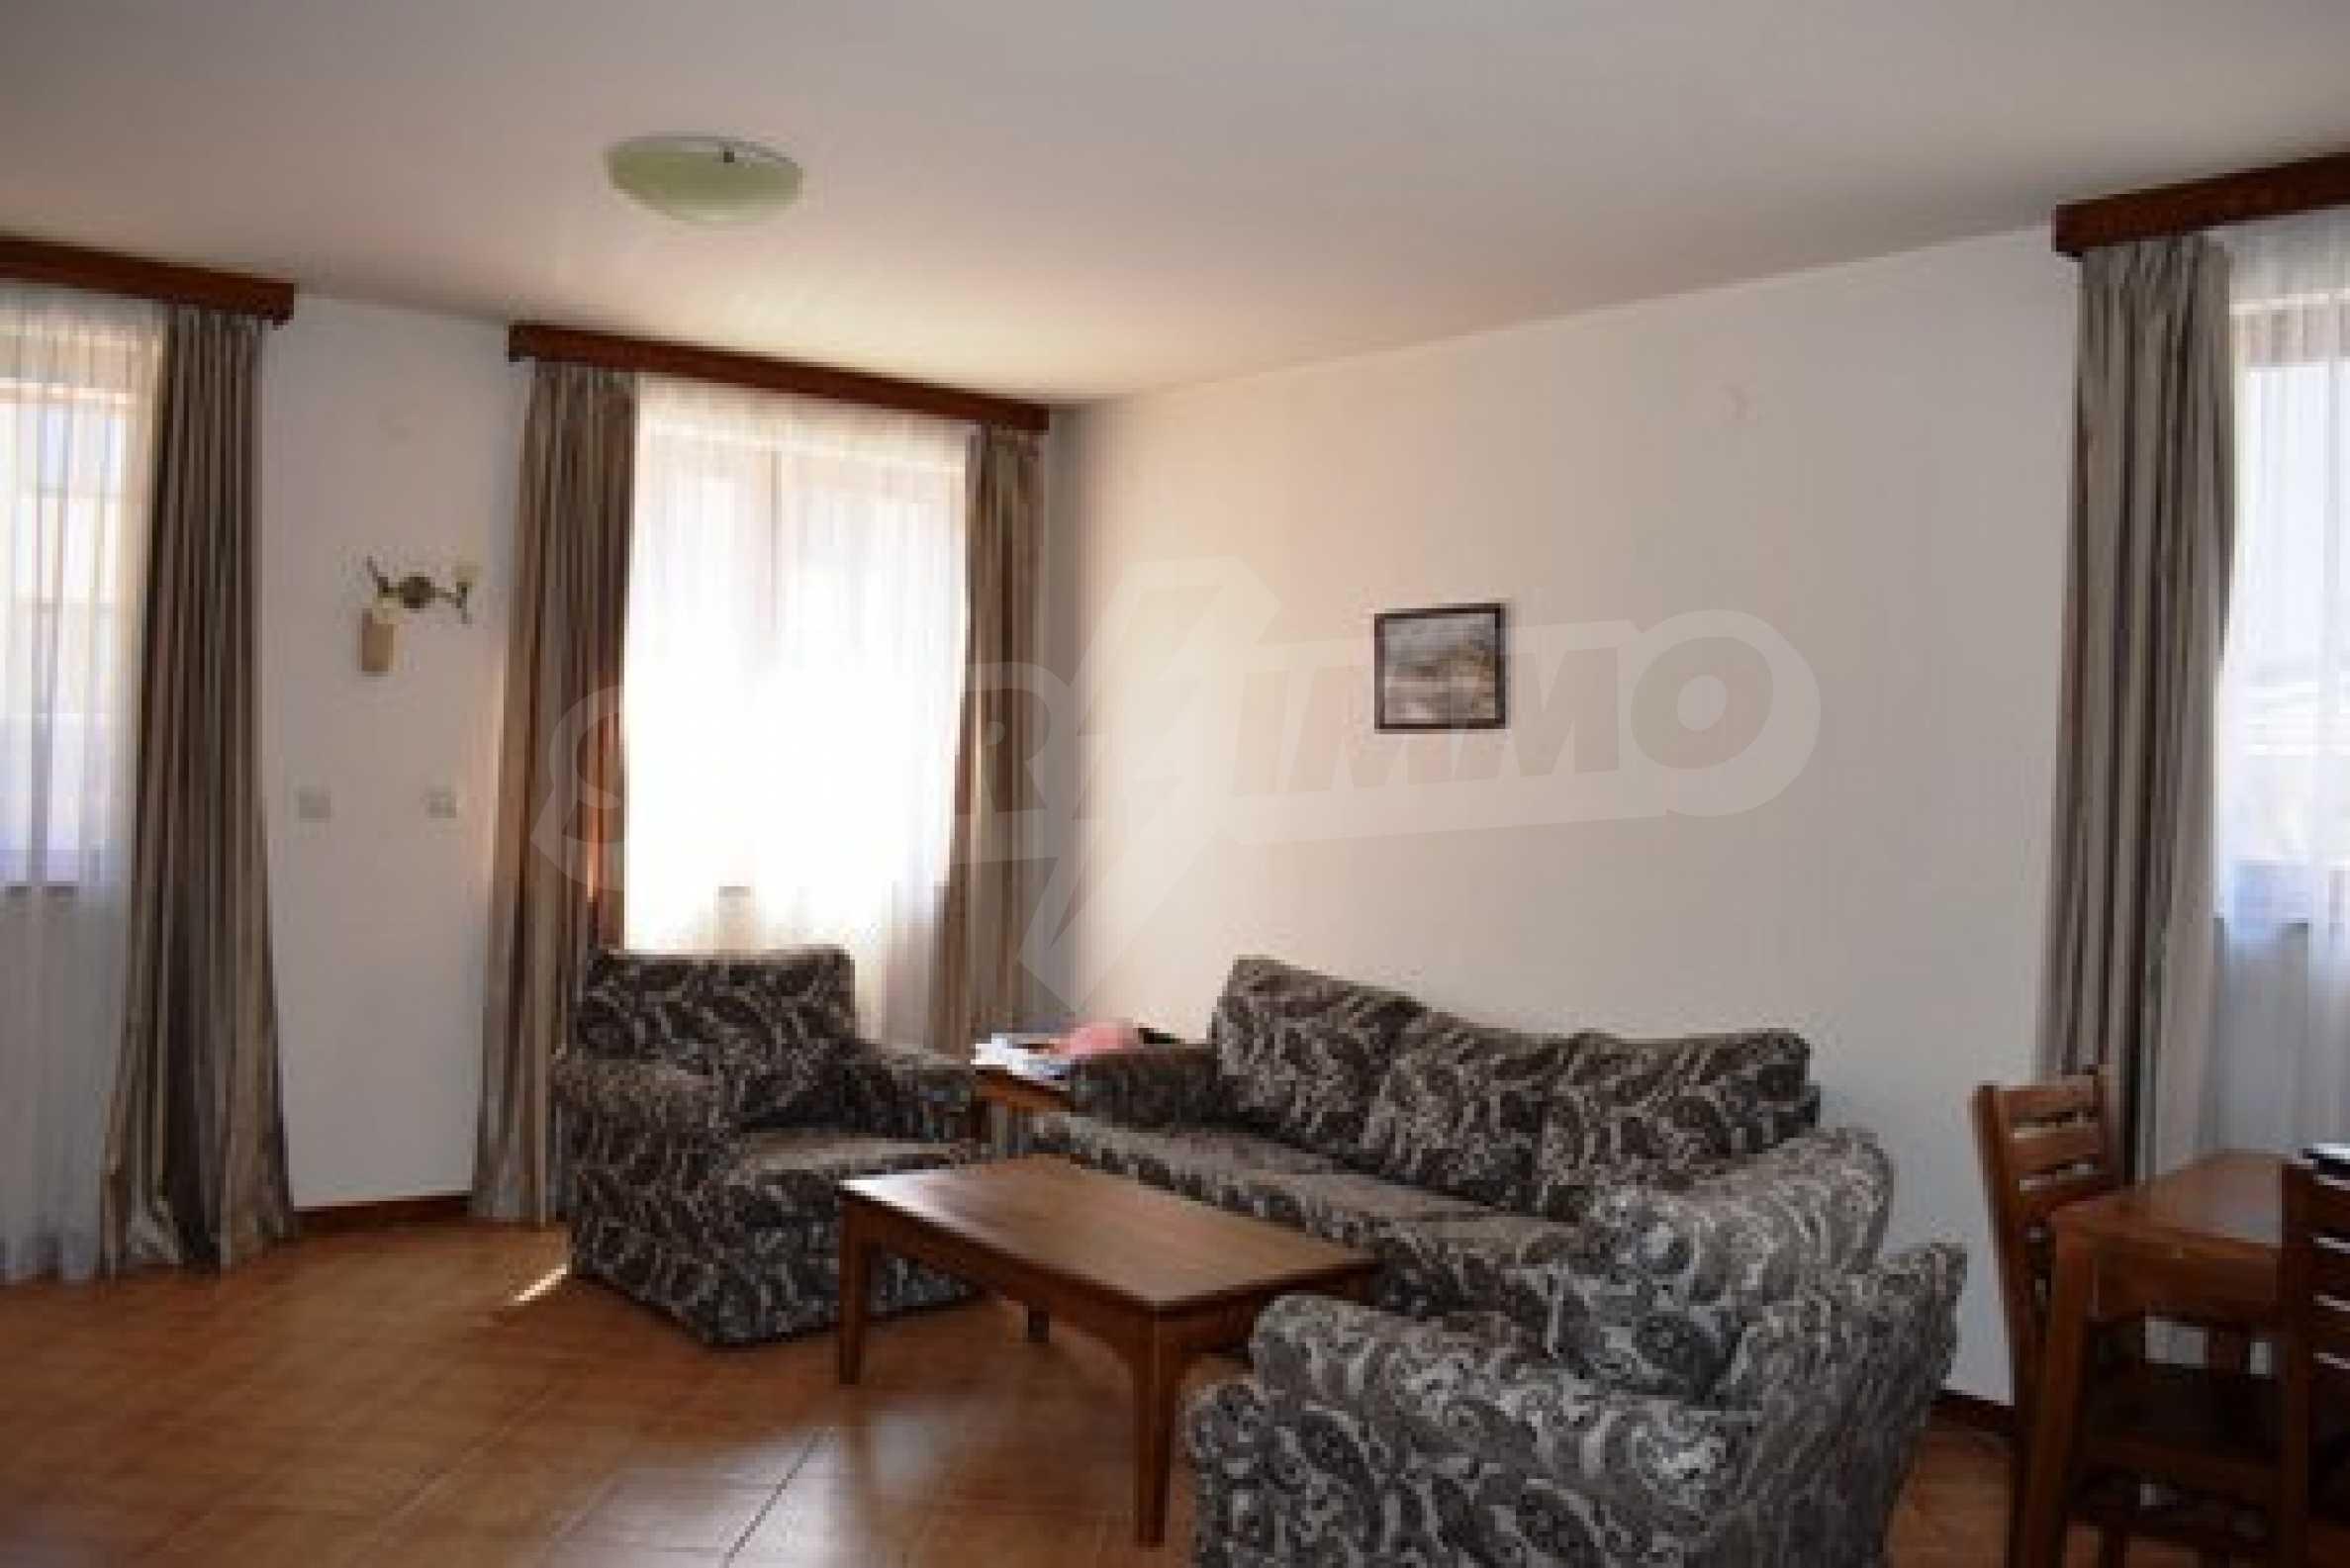 Двустаен апартамент в близост до голф клуб в района на Банско и Разлог 1